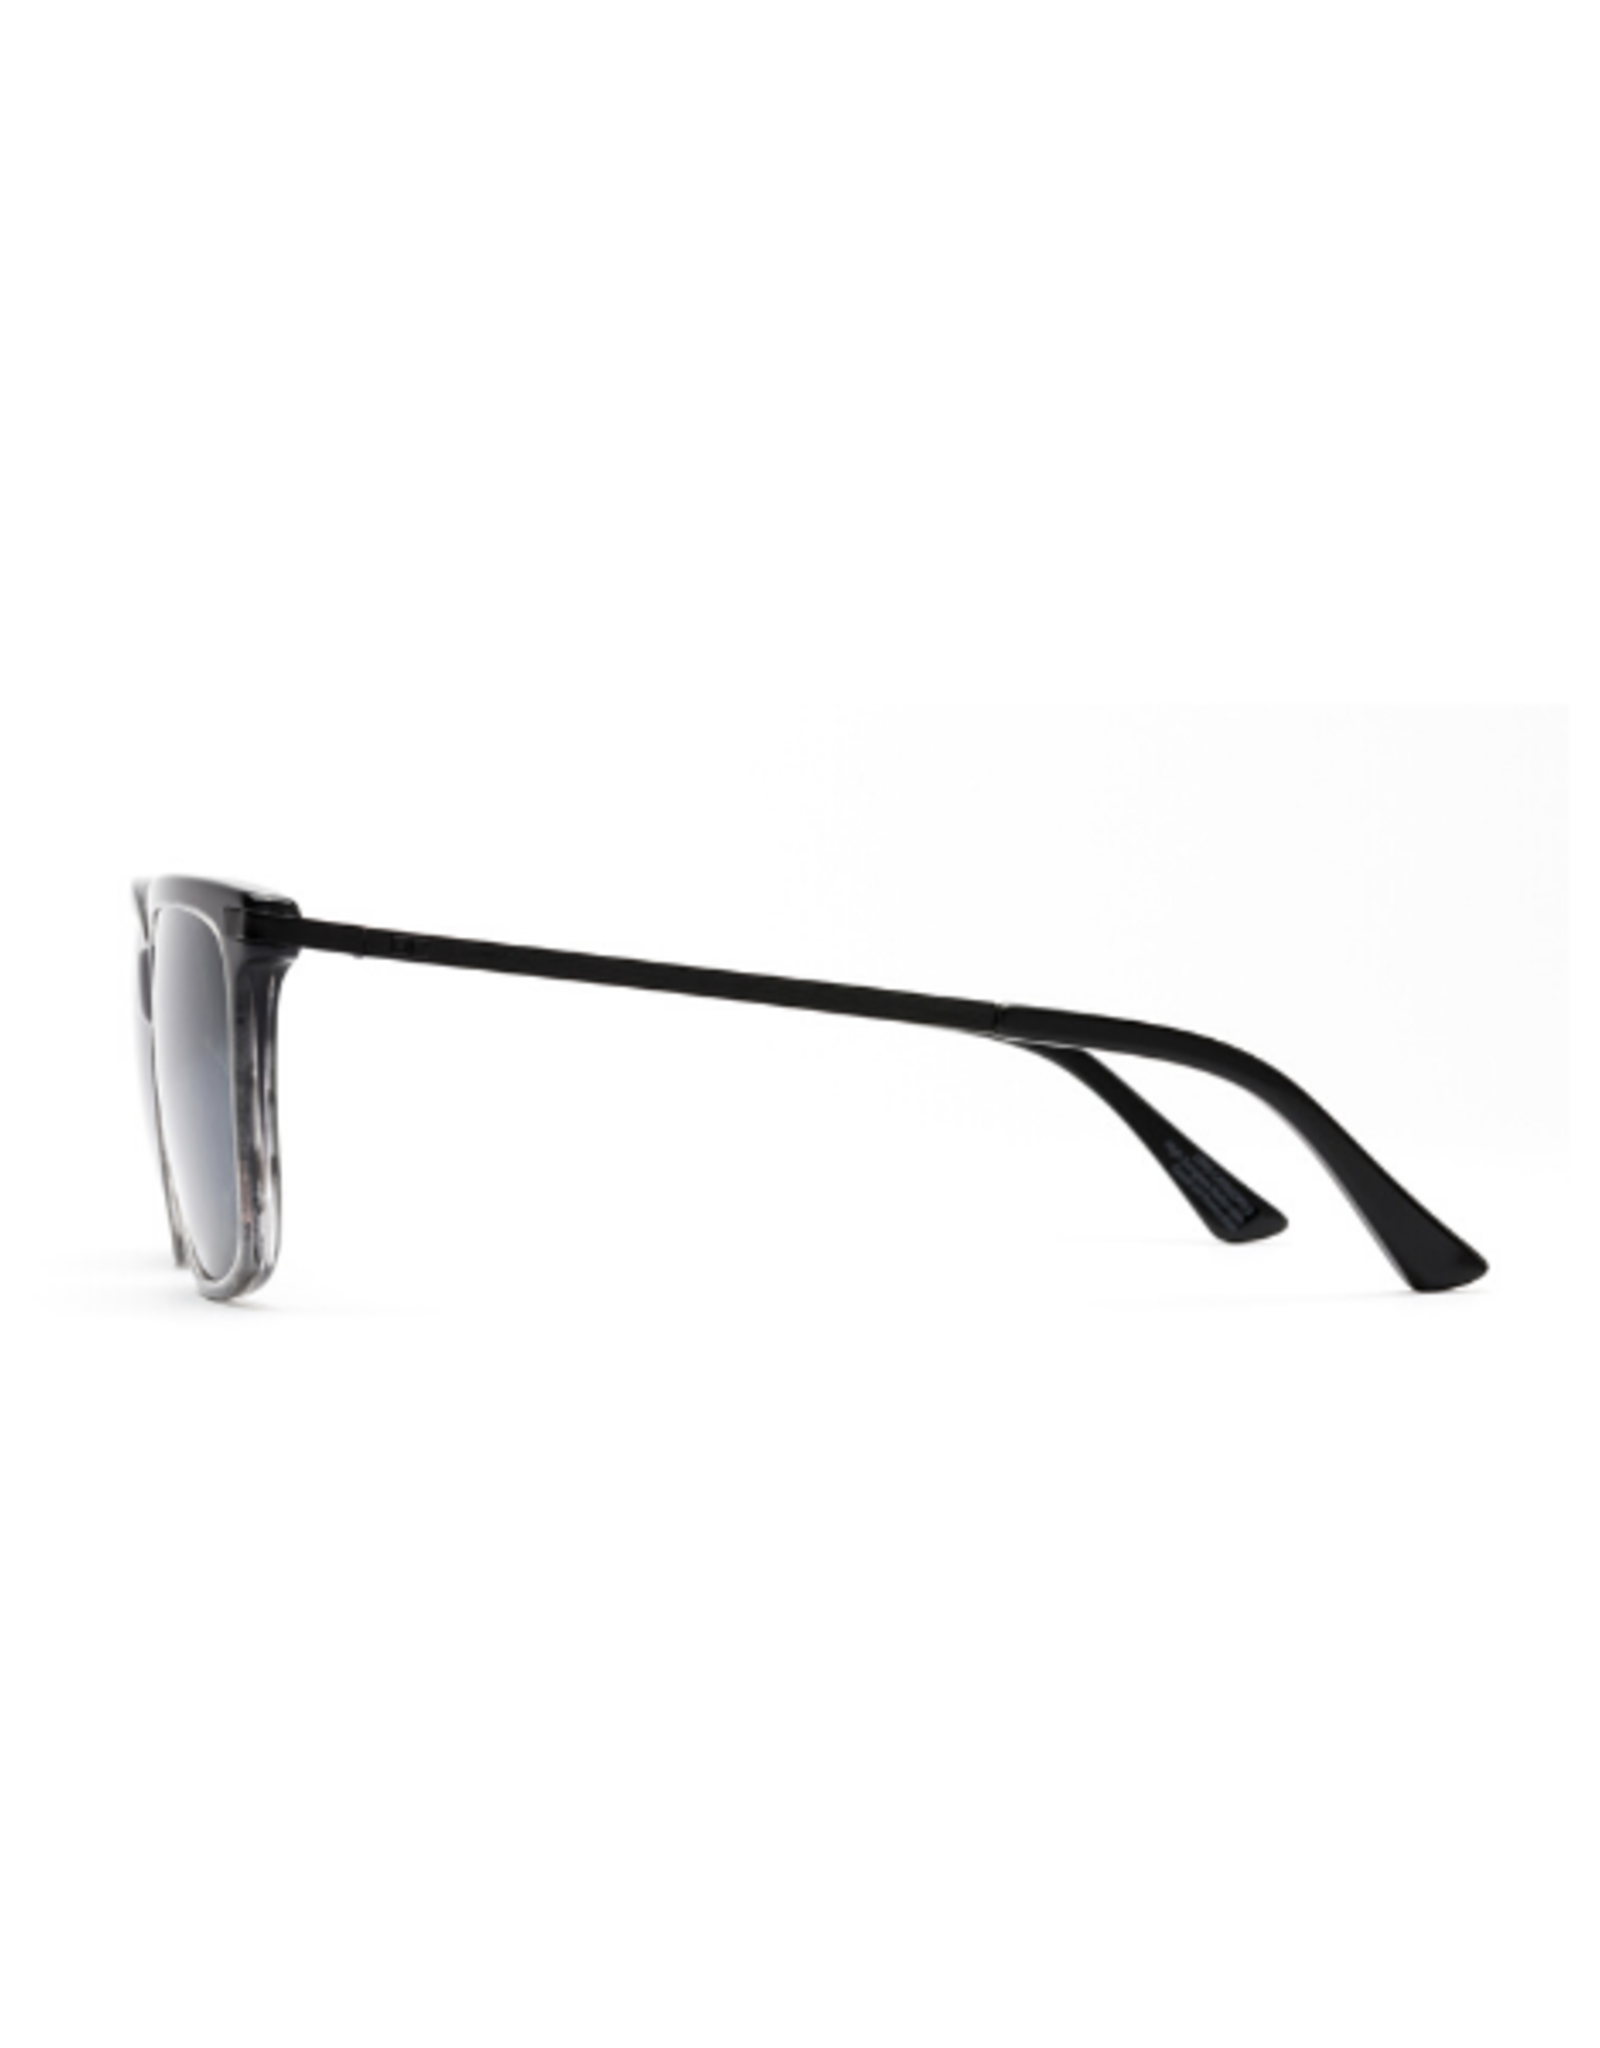 Otis Eyewear 19-2001P Crossroads Reflect Smoke Gradient/Flash MIR GRY Polar